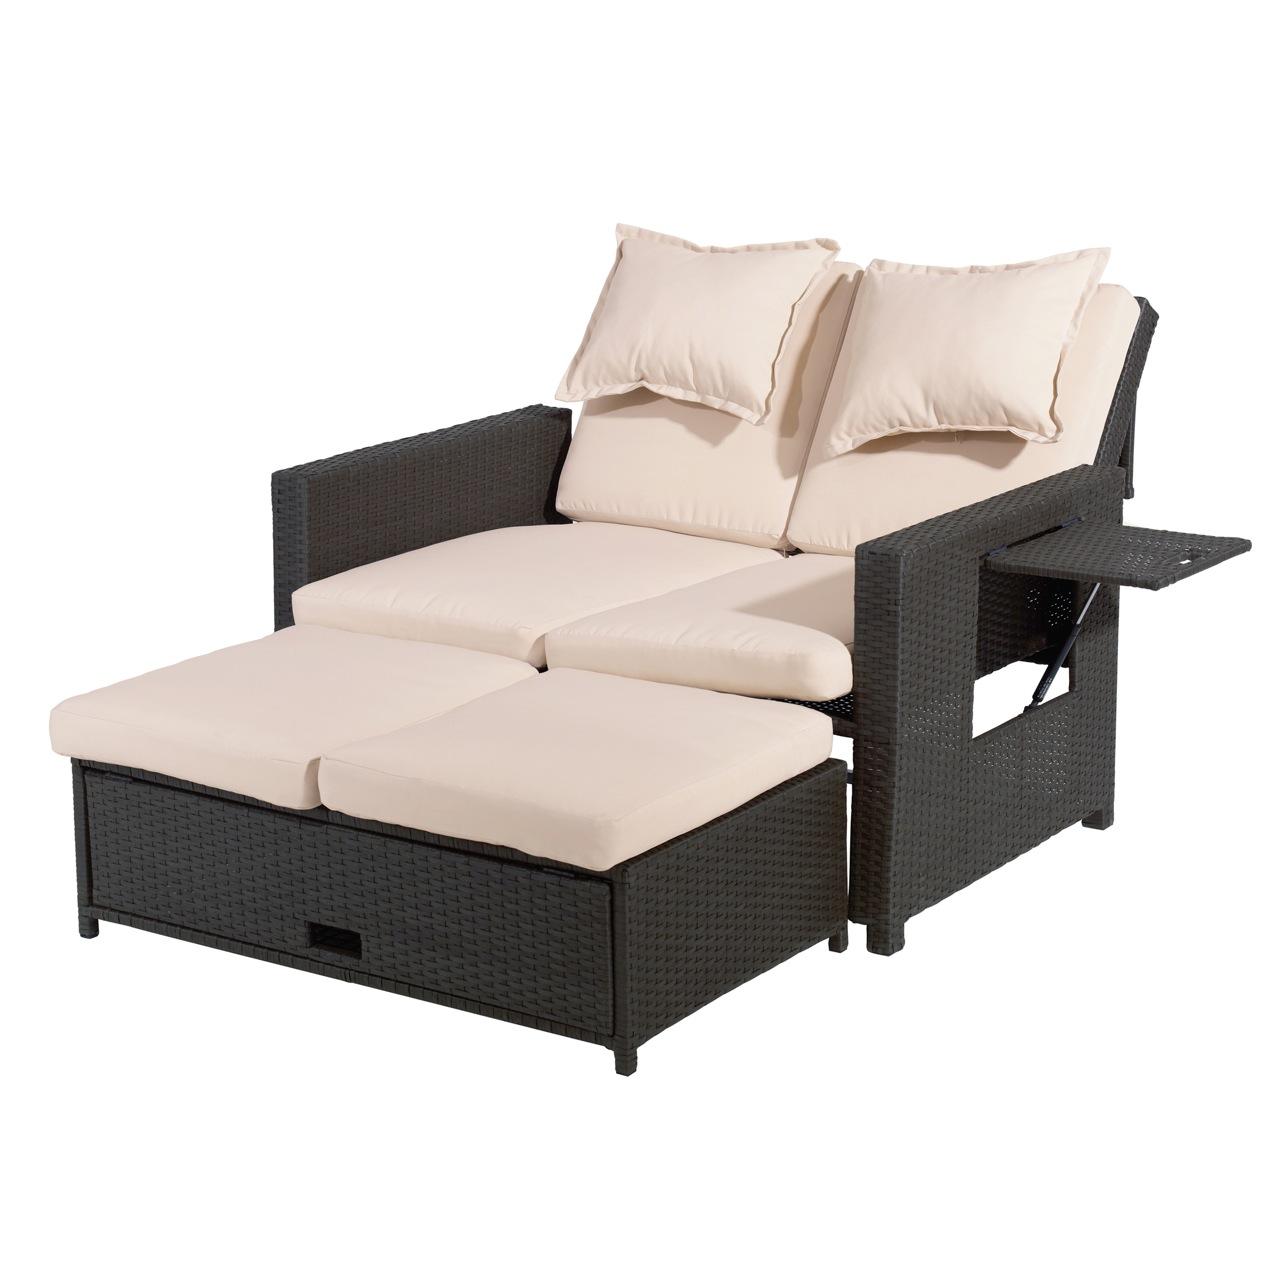 sofa porta angebote auf waterige. Black Bedroom Furniture Sets. Home Design Ideas